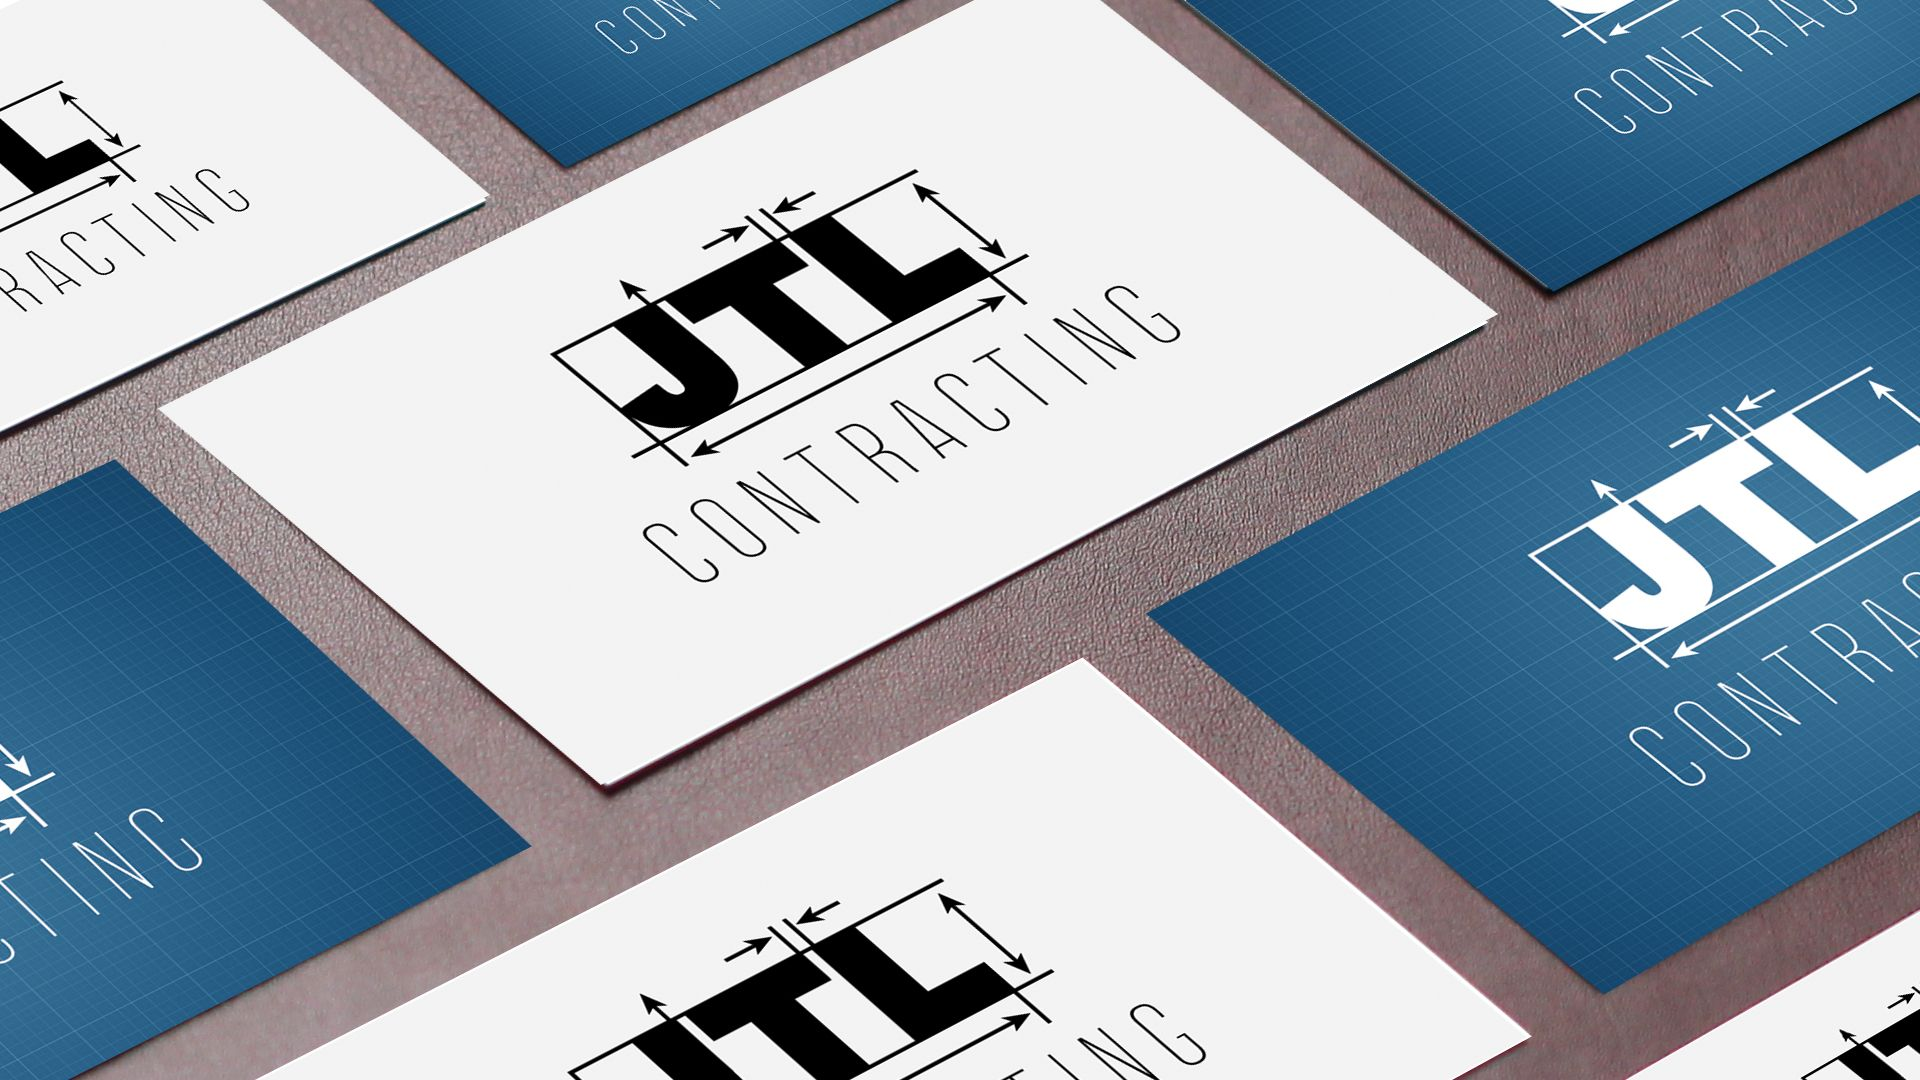 Jtl logo modern logo contracting logo blueprint logo d t s jtl logo modern logo contracting logo blueprint logo malvernweather Image collections